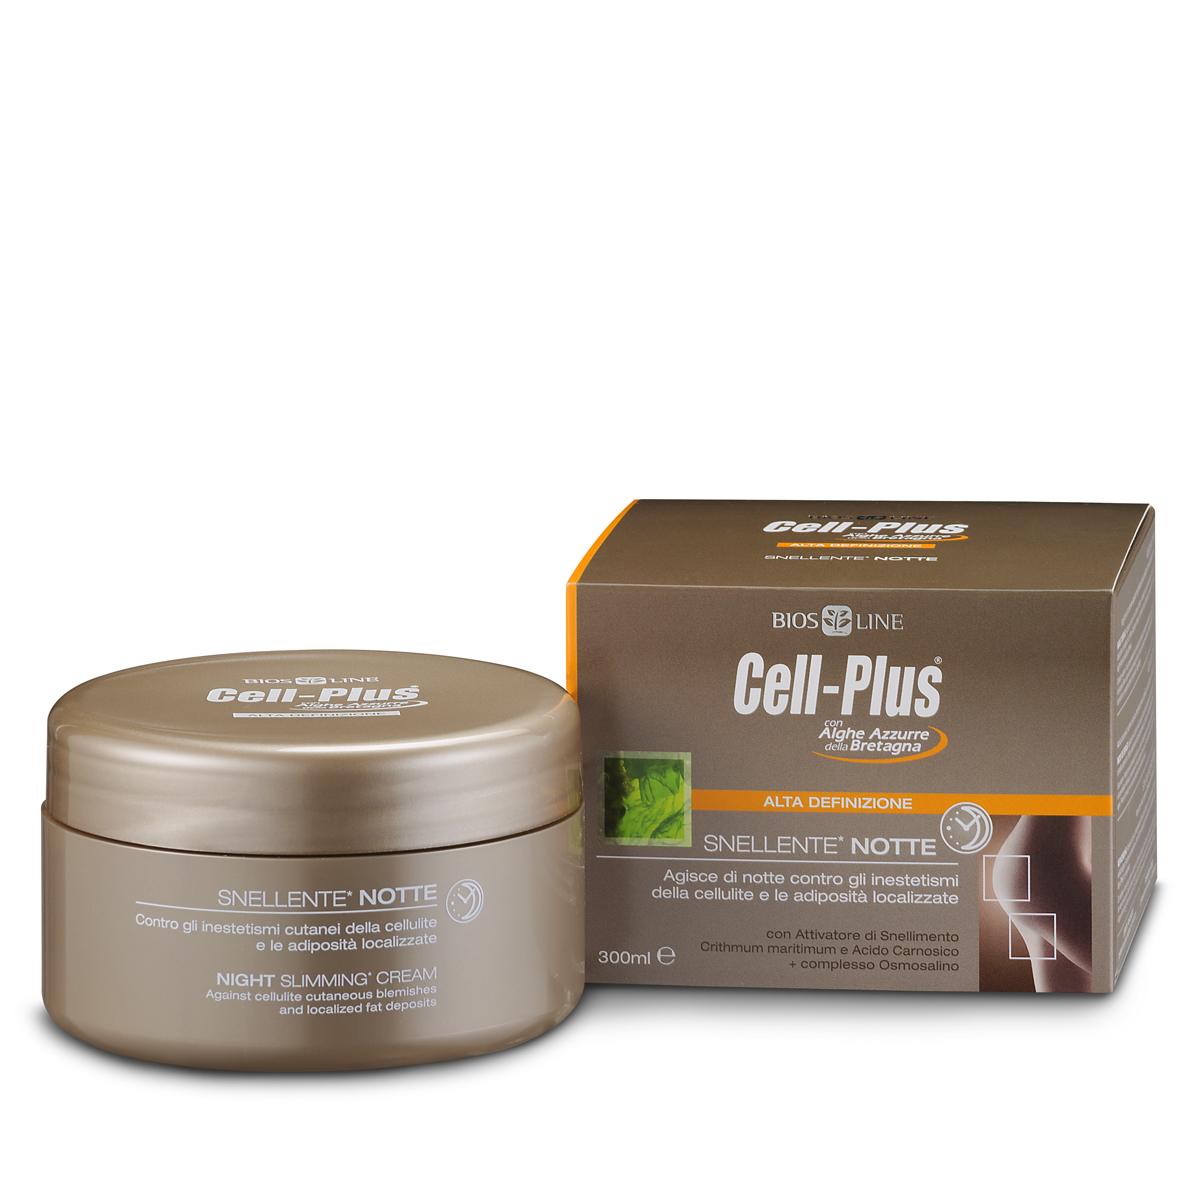 Крем Cell-Plus для похудания, ночной уход, 300 мл (Bios Line S.p.A)